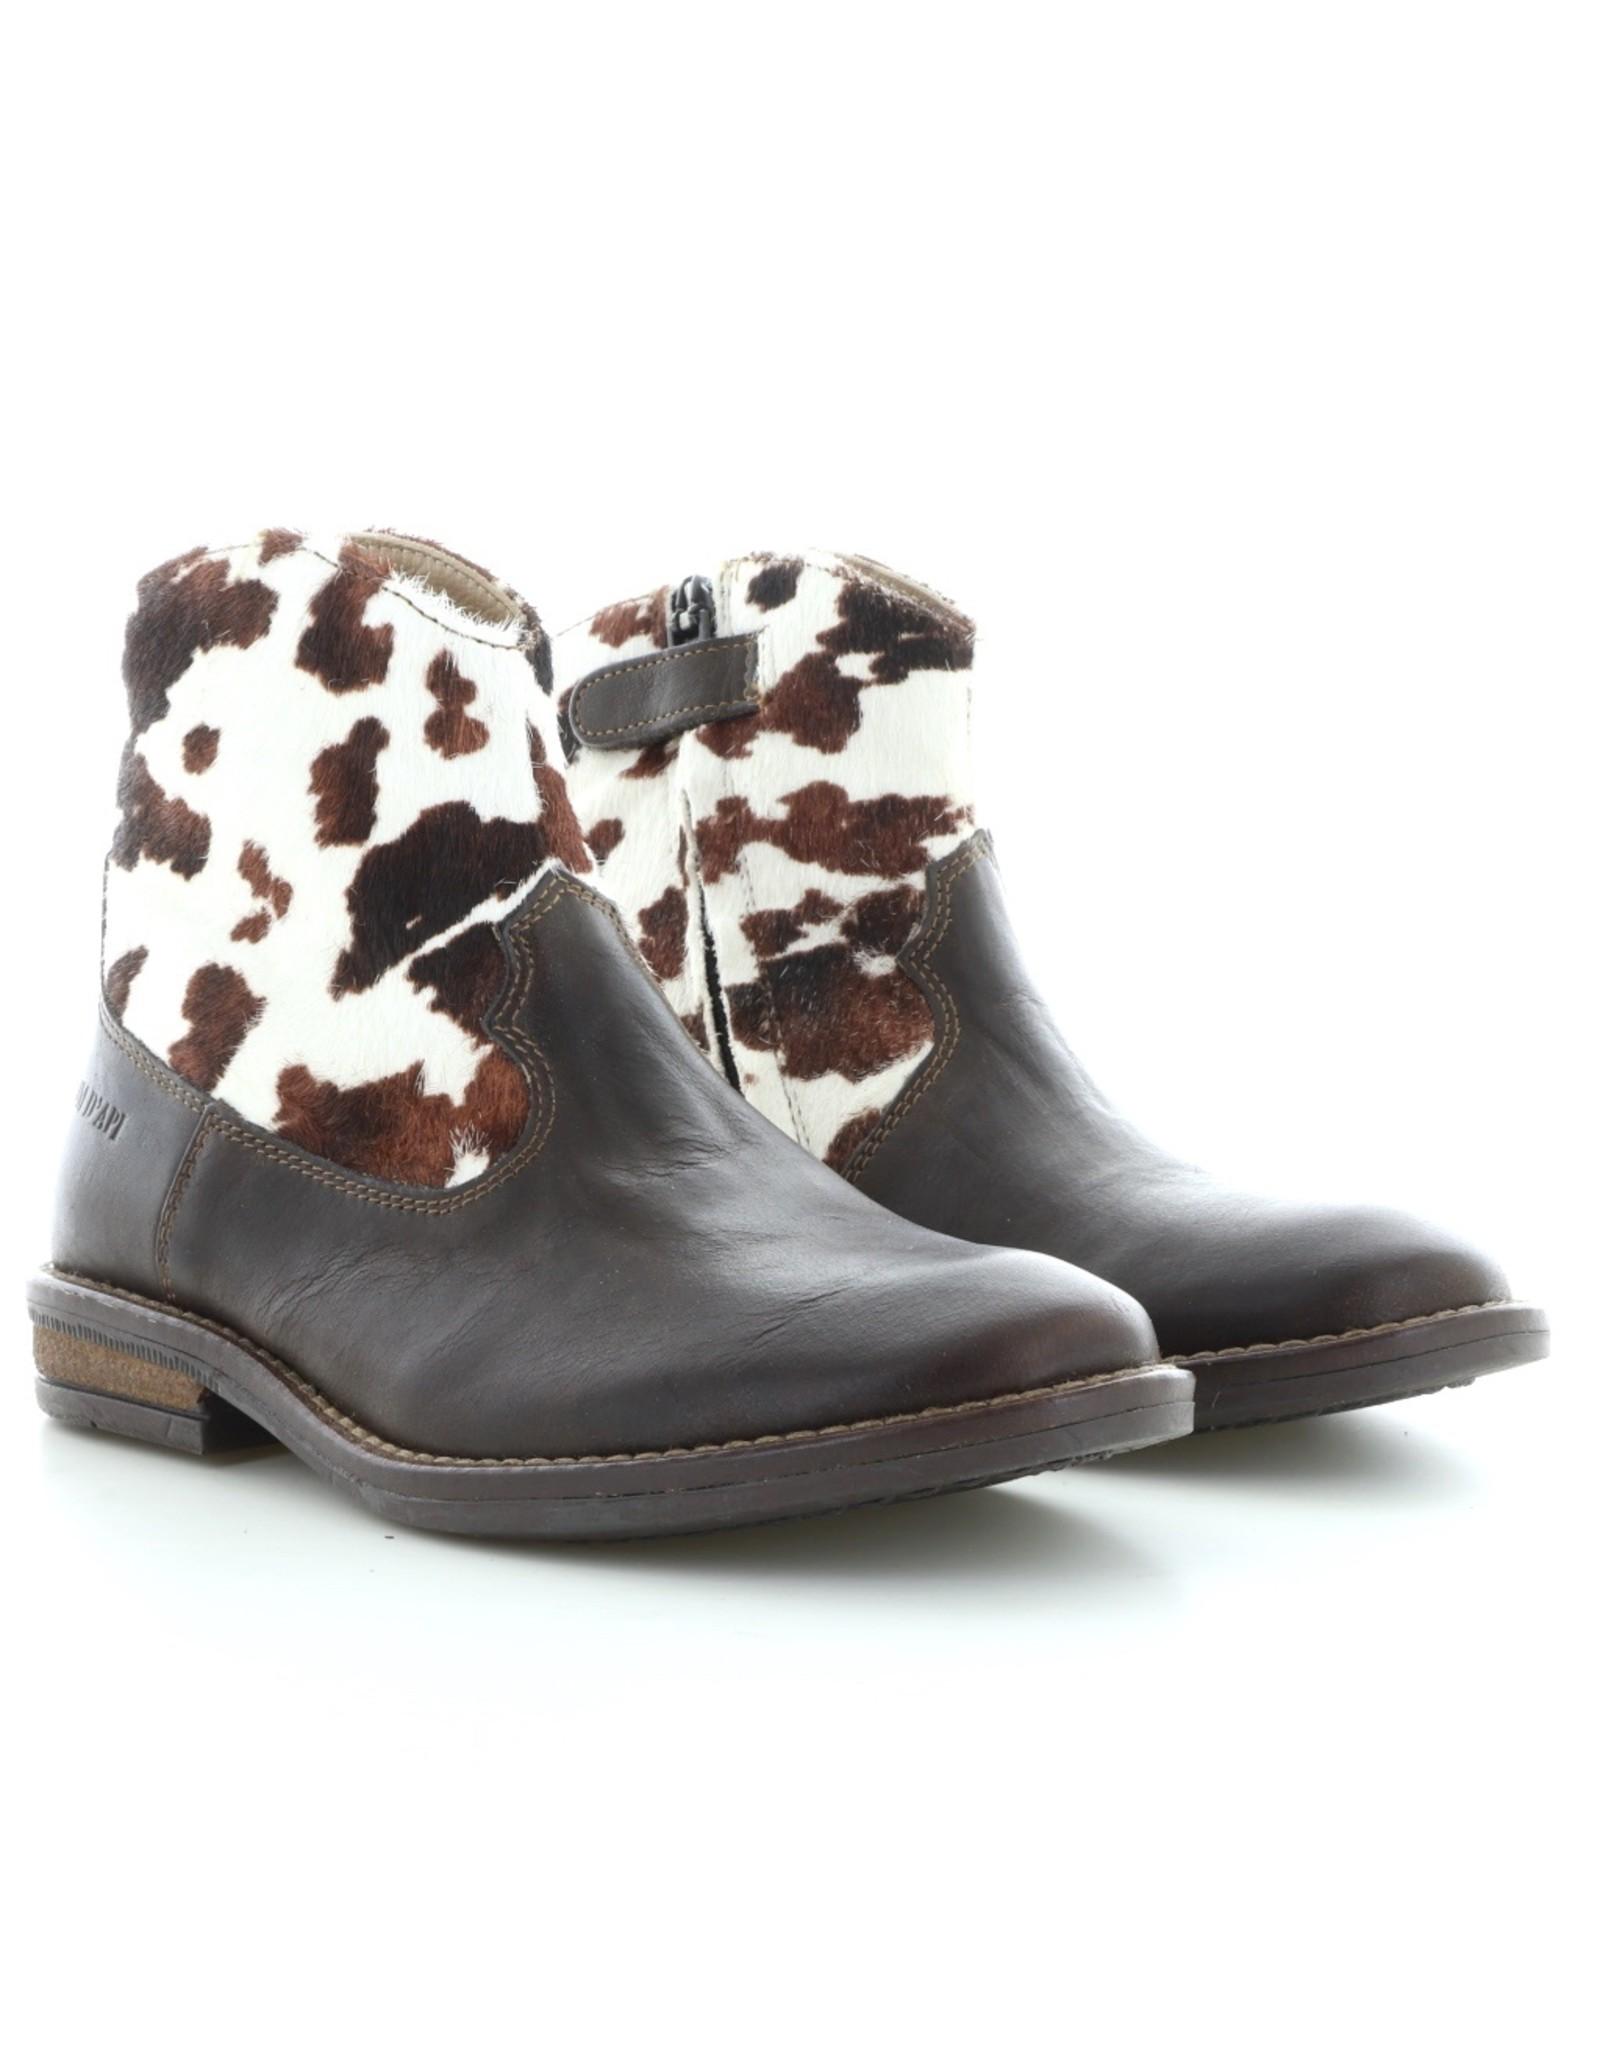 Pom d'api Billy boots cow